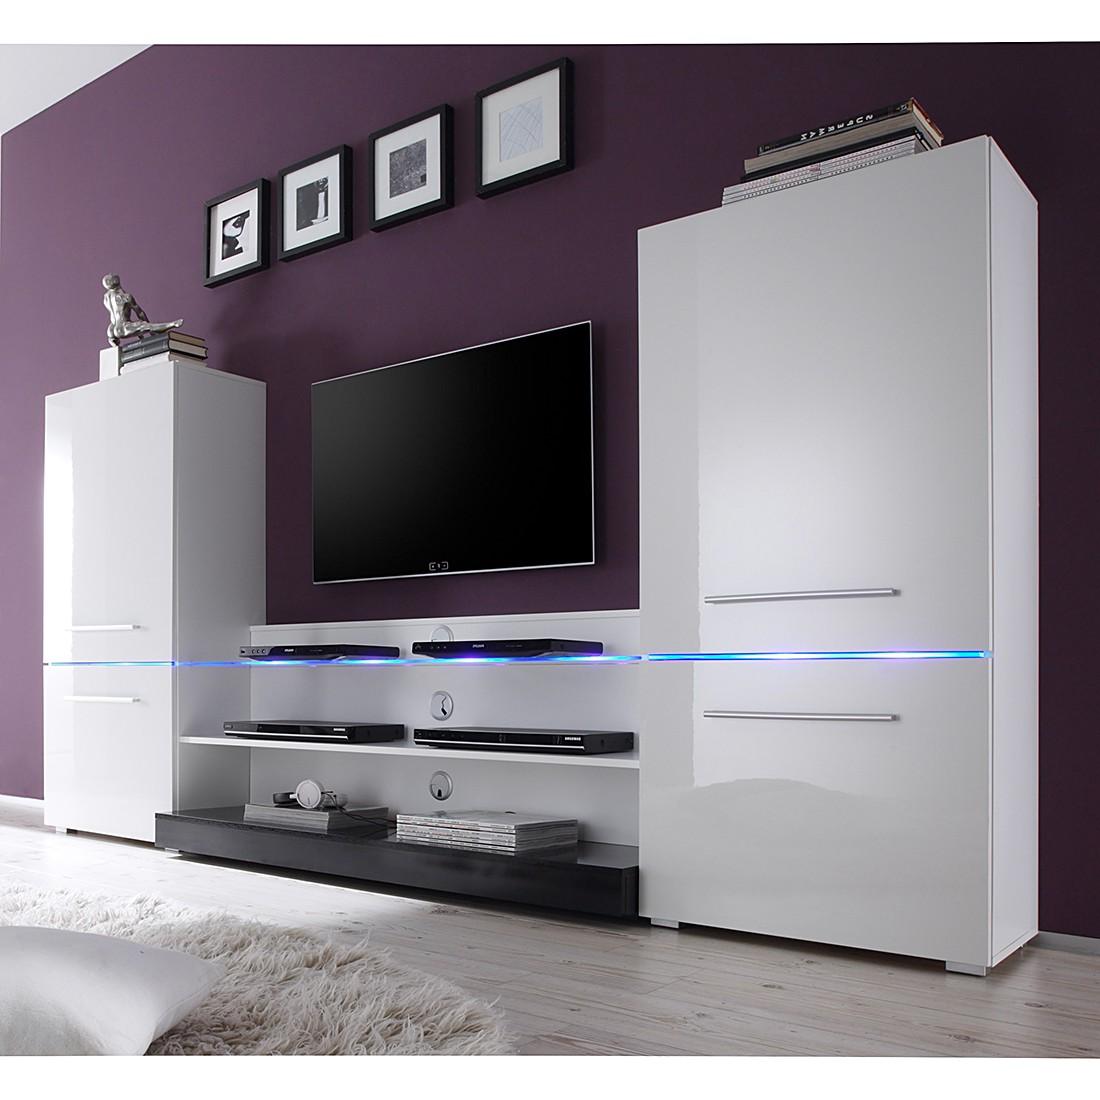 EEK A+, Wohnwand Modern Art (3-teilig) – inkl. Beleuchtung – Hochglanz Weiß, roomscape online kaufen